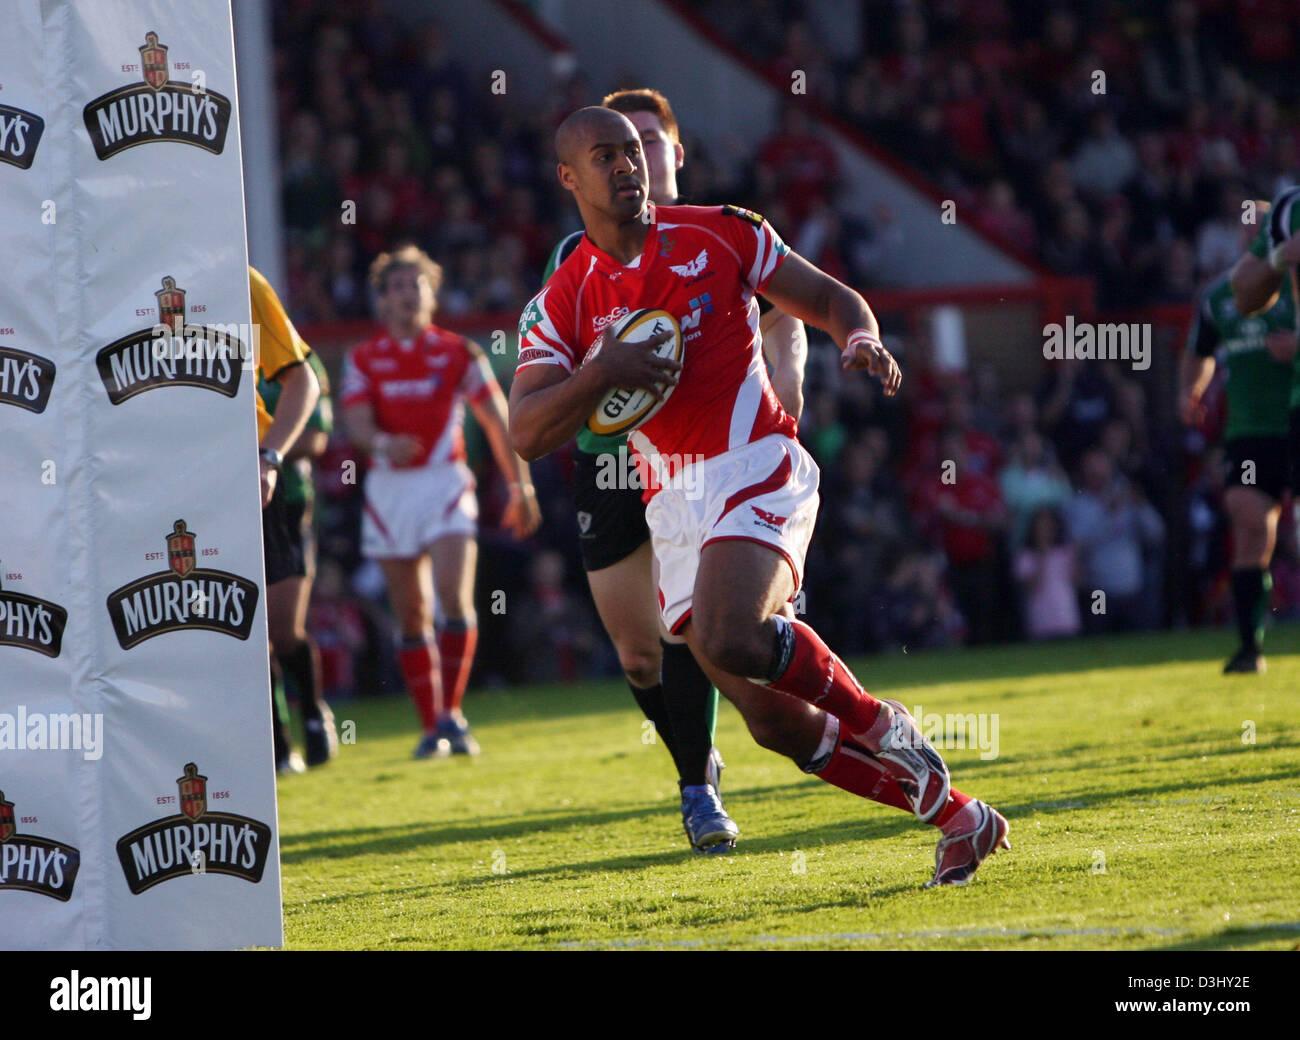 13 09 08  Scarlets v Connacht  Scarlets' Nathan Brew goes